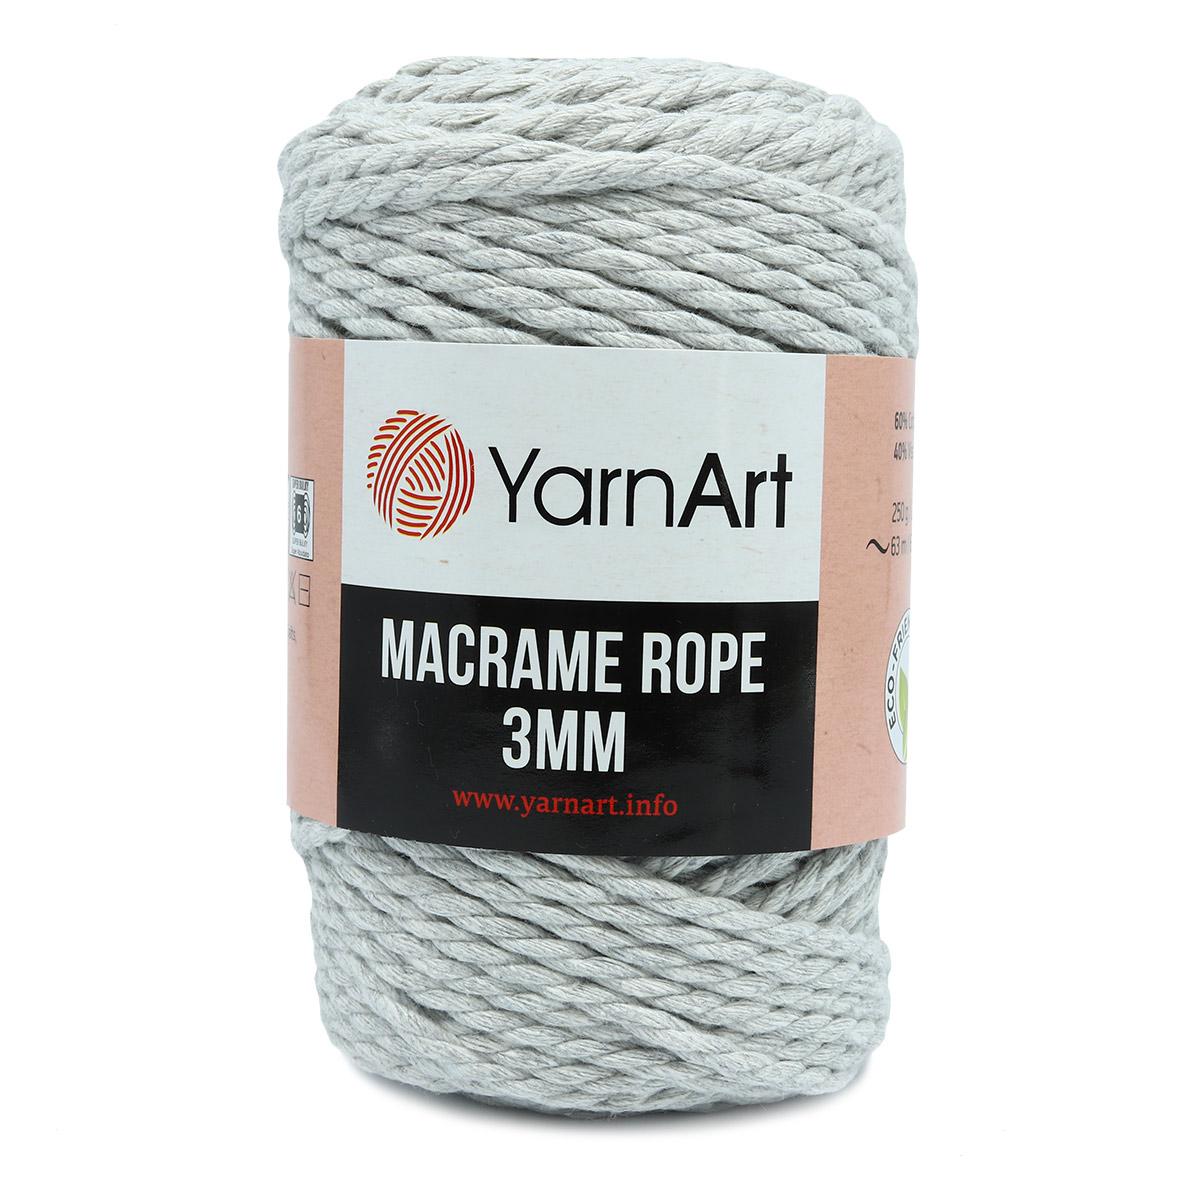 Пряжа YarnArt 'Macrame Rope 3мм' 250гр 63м (60% хлопок, 40% вискоза и полиэстер)